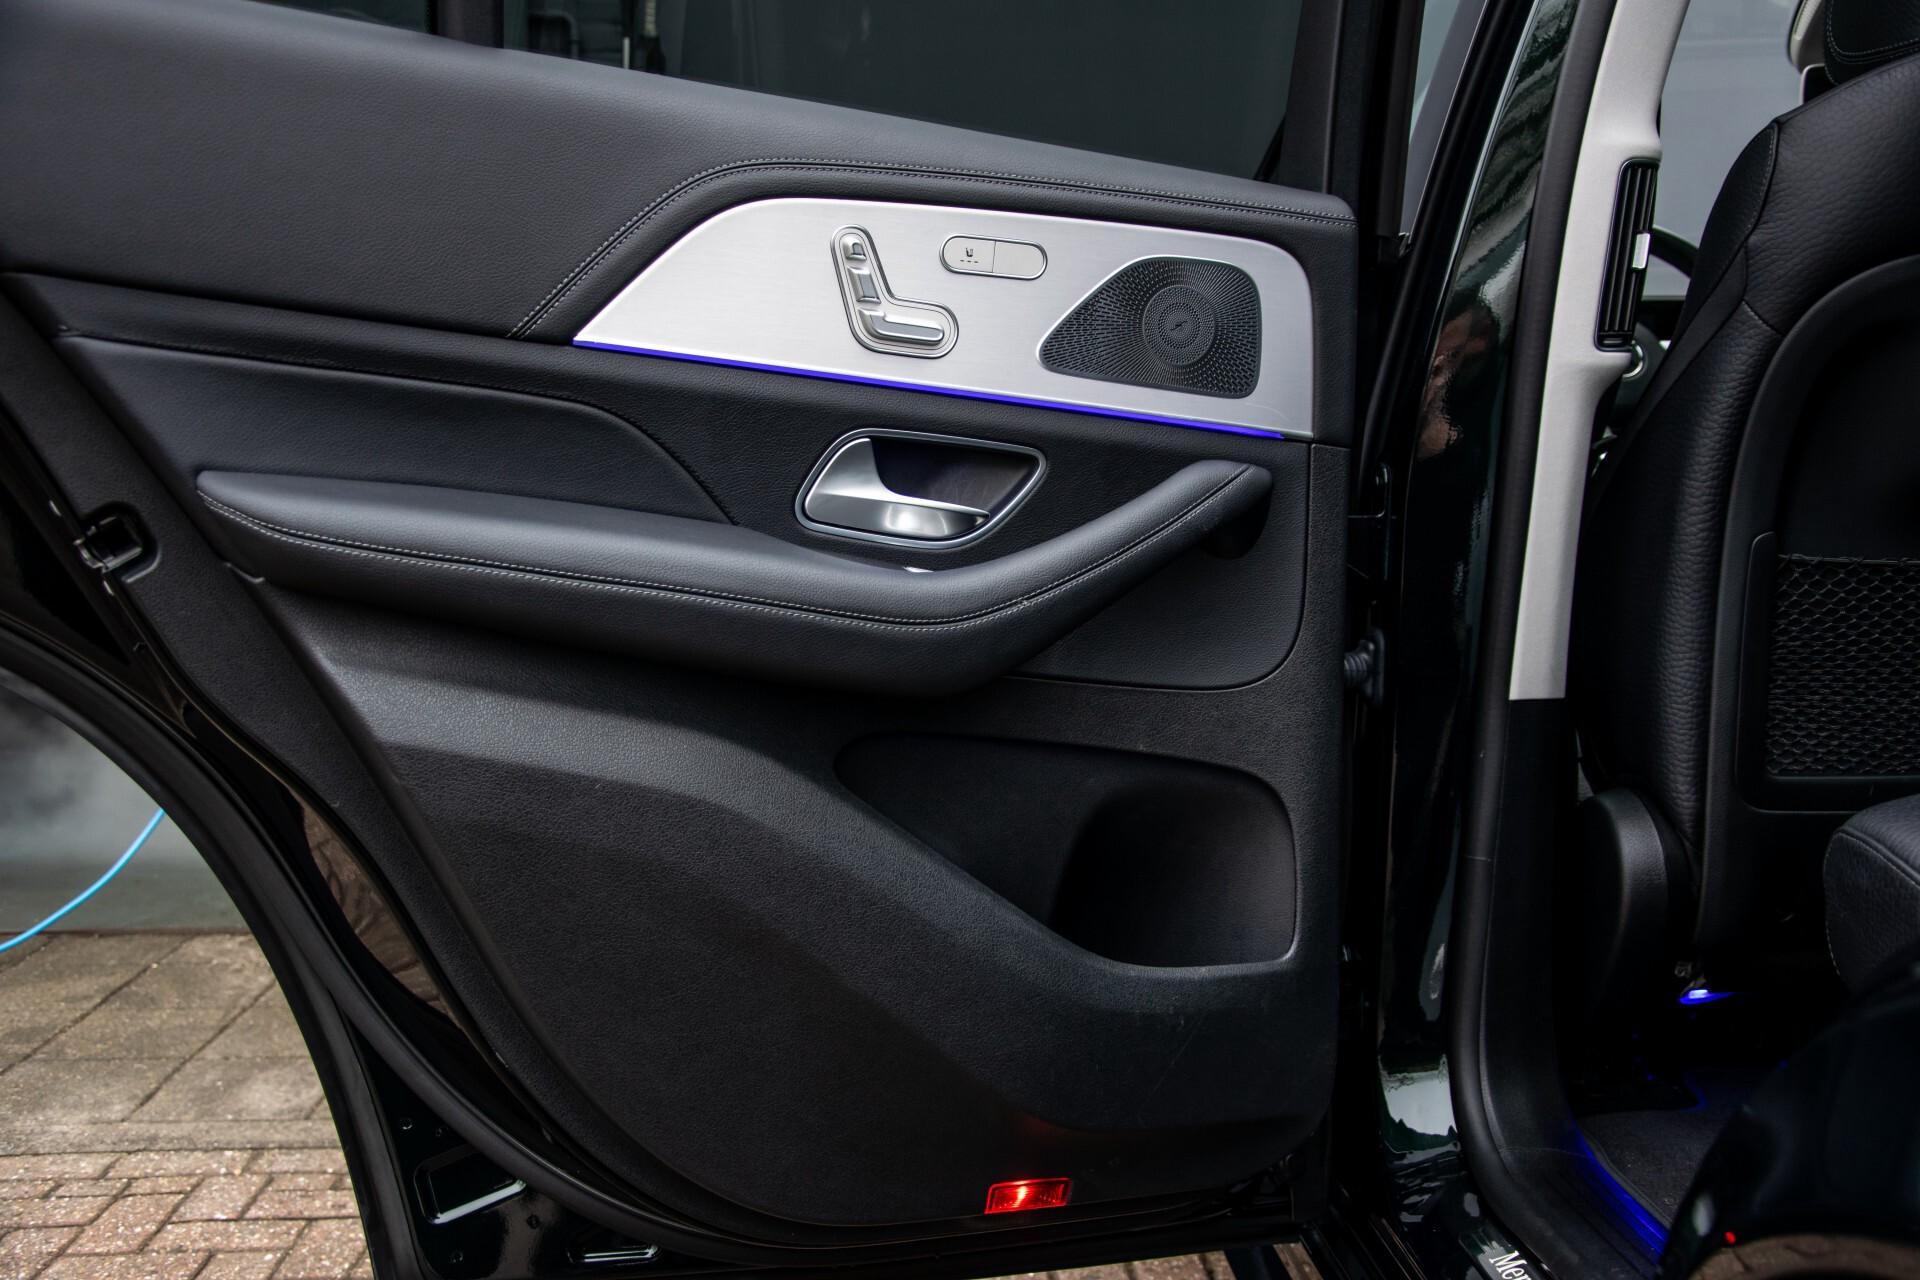 Mercedes-Benz GLE 450 4-M 7-Persoons AMG Massage/Rij-assist/Keyless/TV/360/Night/Trekhaak Aut9 Foto 49